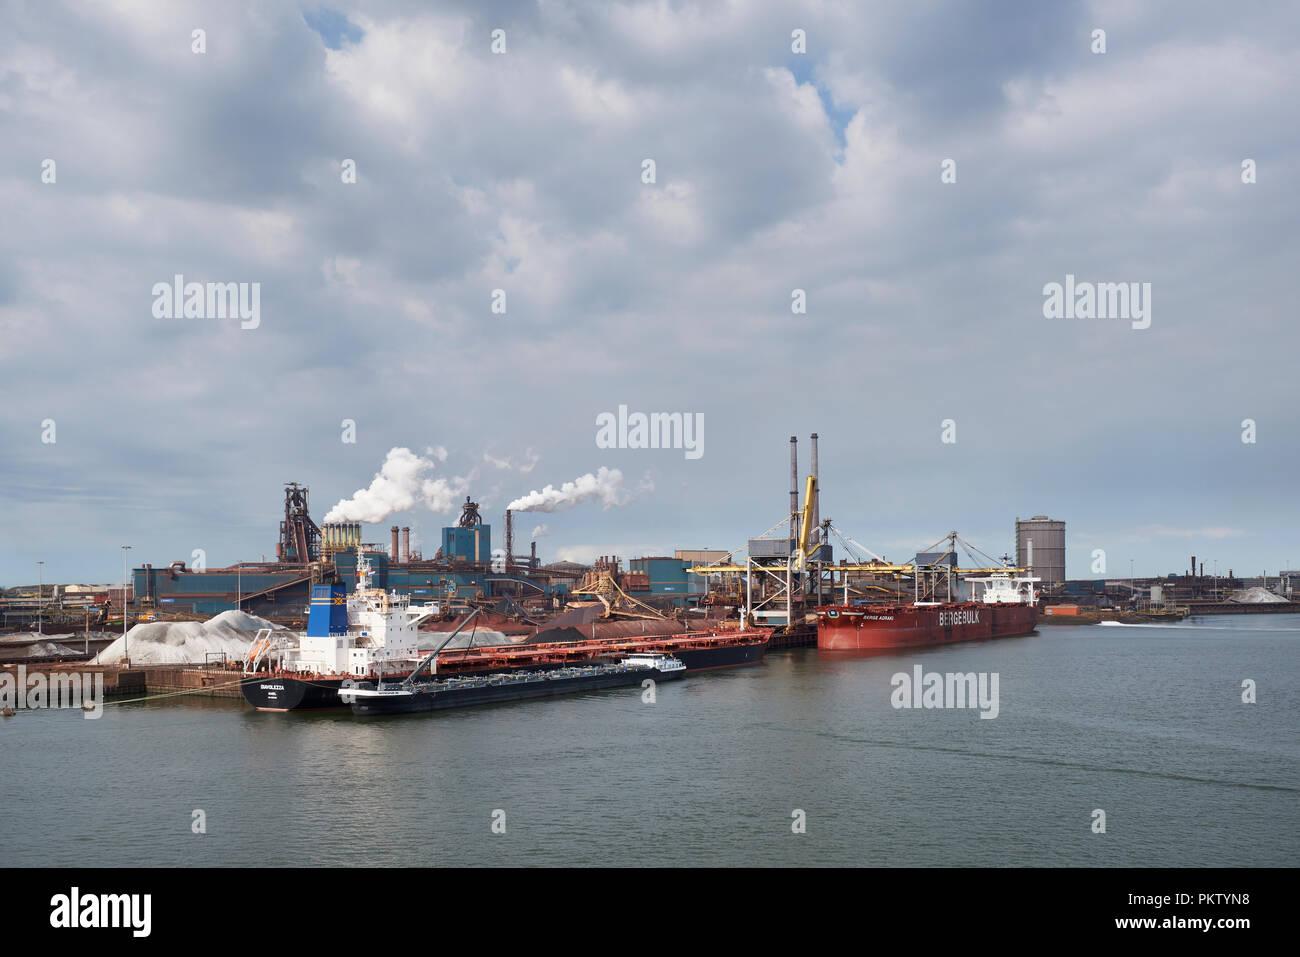 Steel mill of Tata Steel on the North Sea coast near Amsterdam, North Holland, the Netherlands - Stock Image